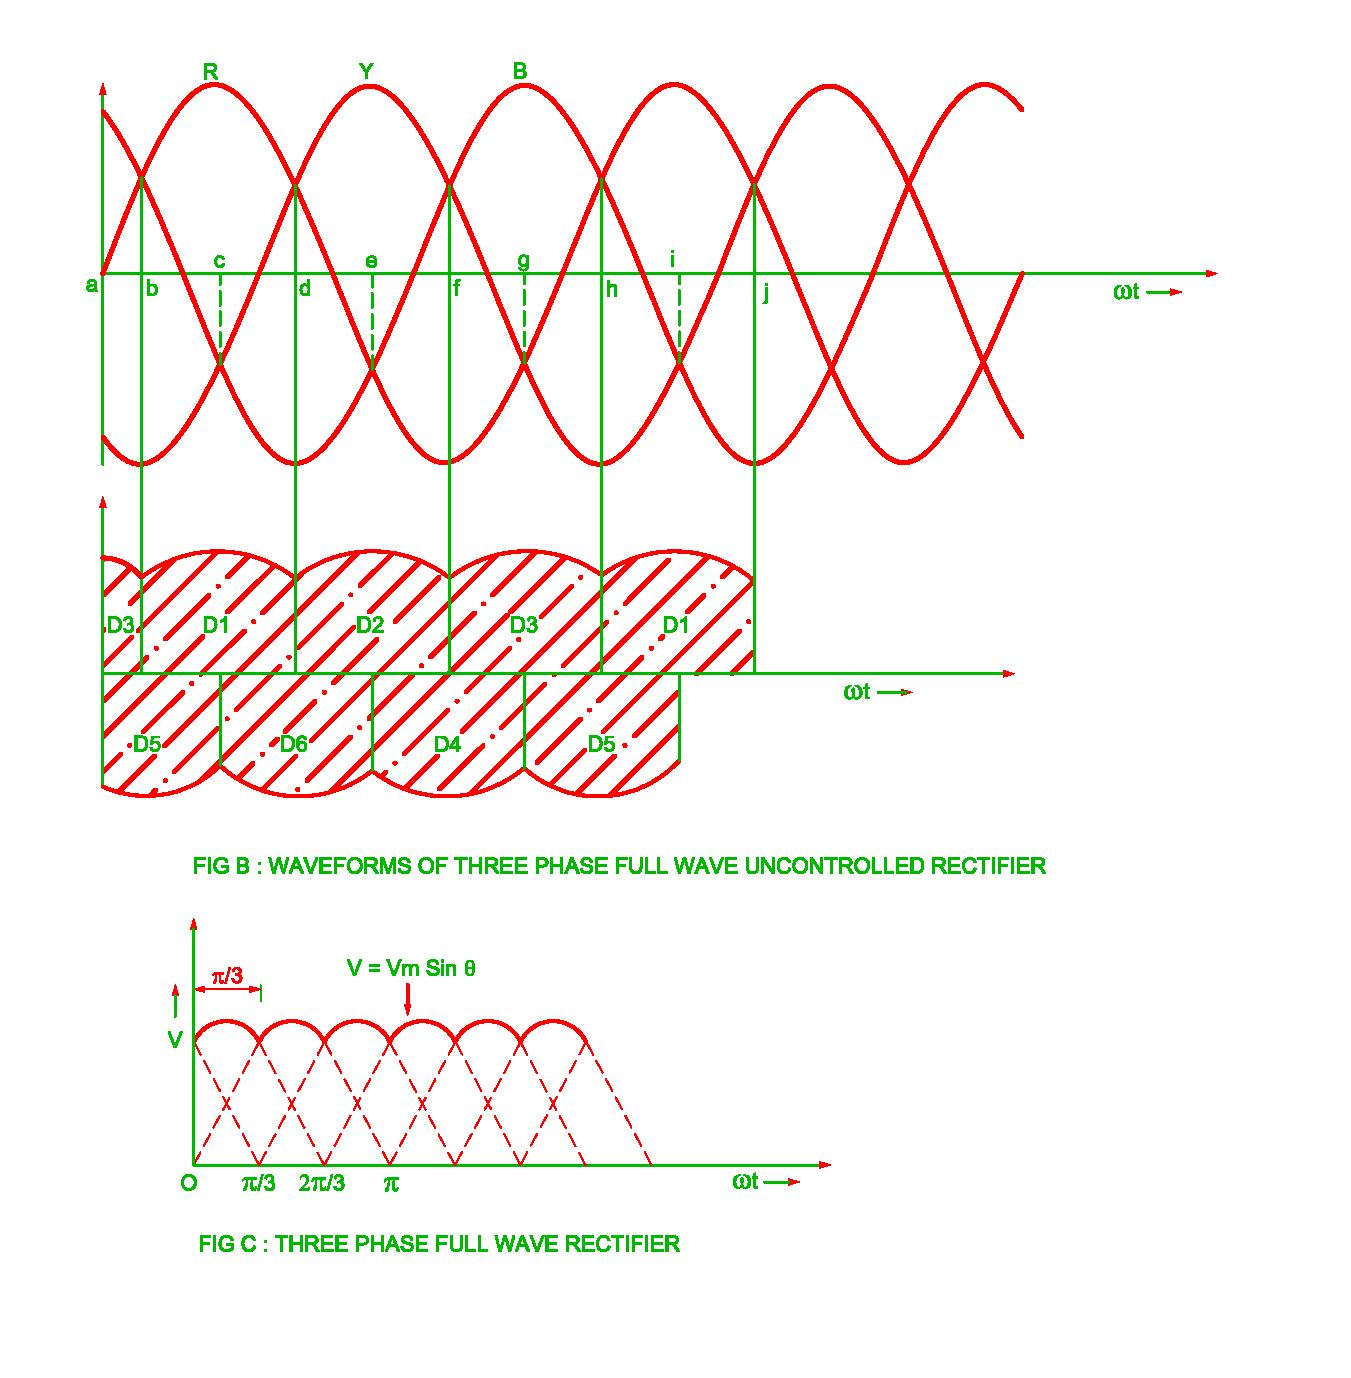 three phase fullwave uncontrolled waveforms jpg [ 1351 x 1378 Pixel ]